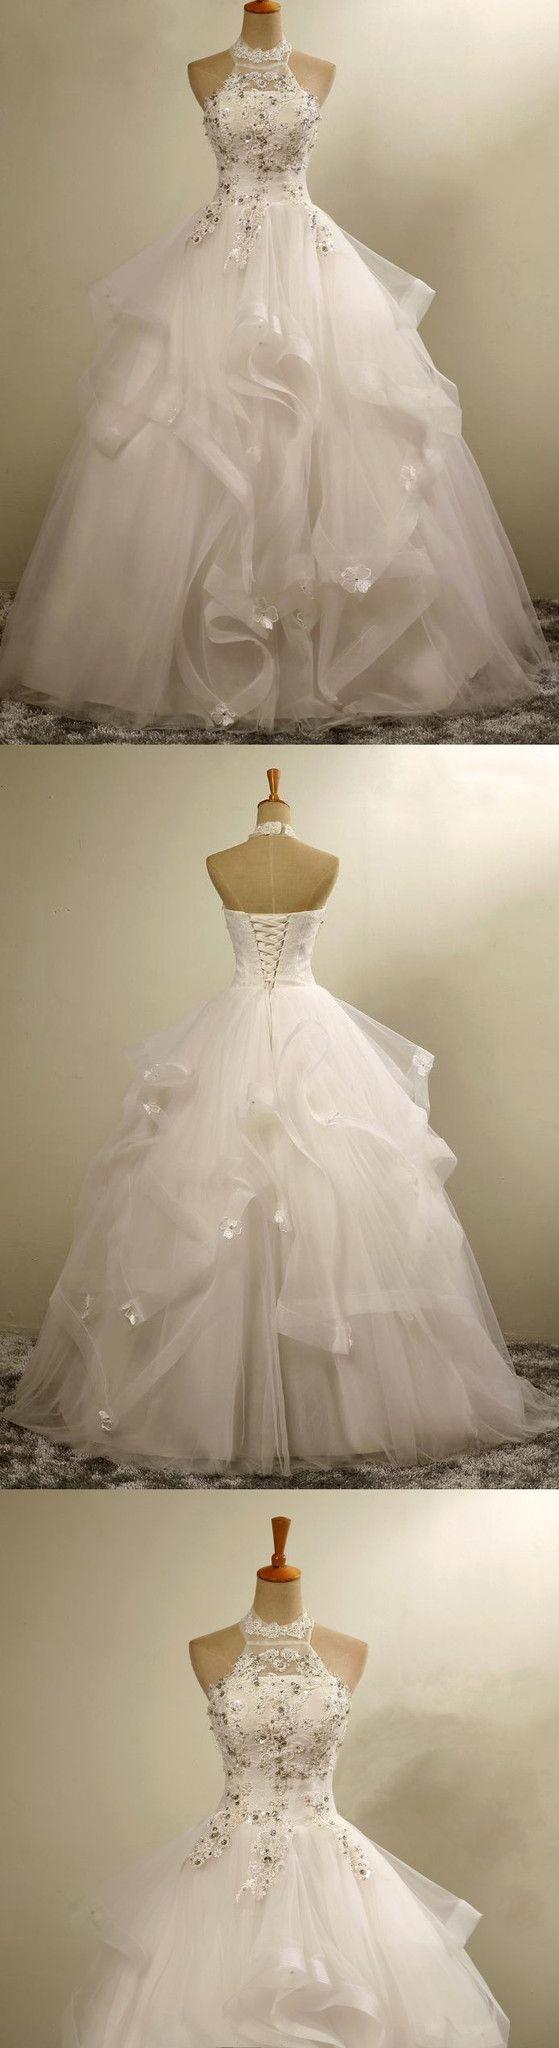 High Neck Elegant Gorgeous Charming Lace Appliques Organza Wedding Dresses, WD164